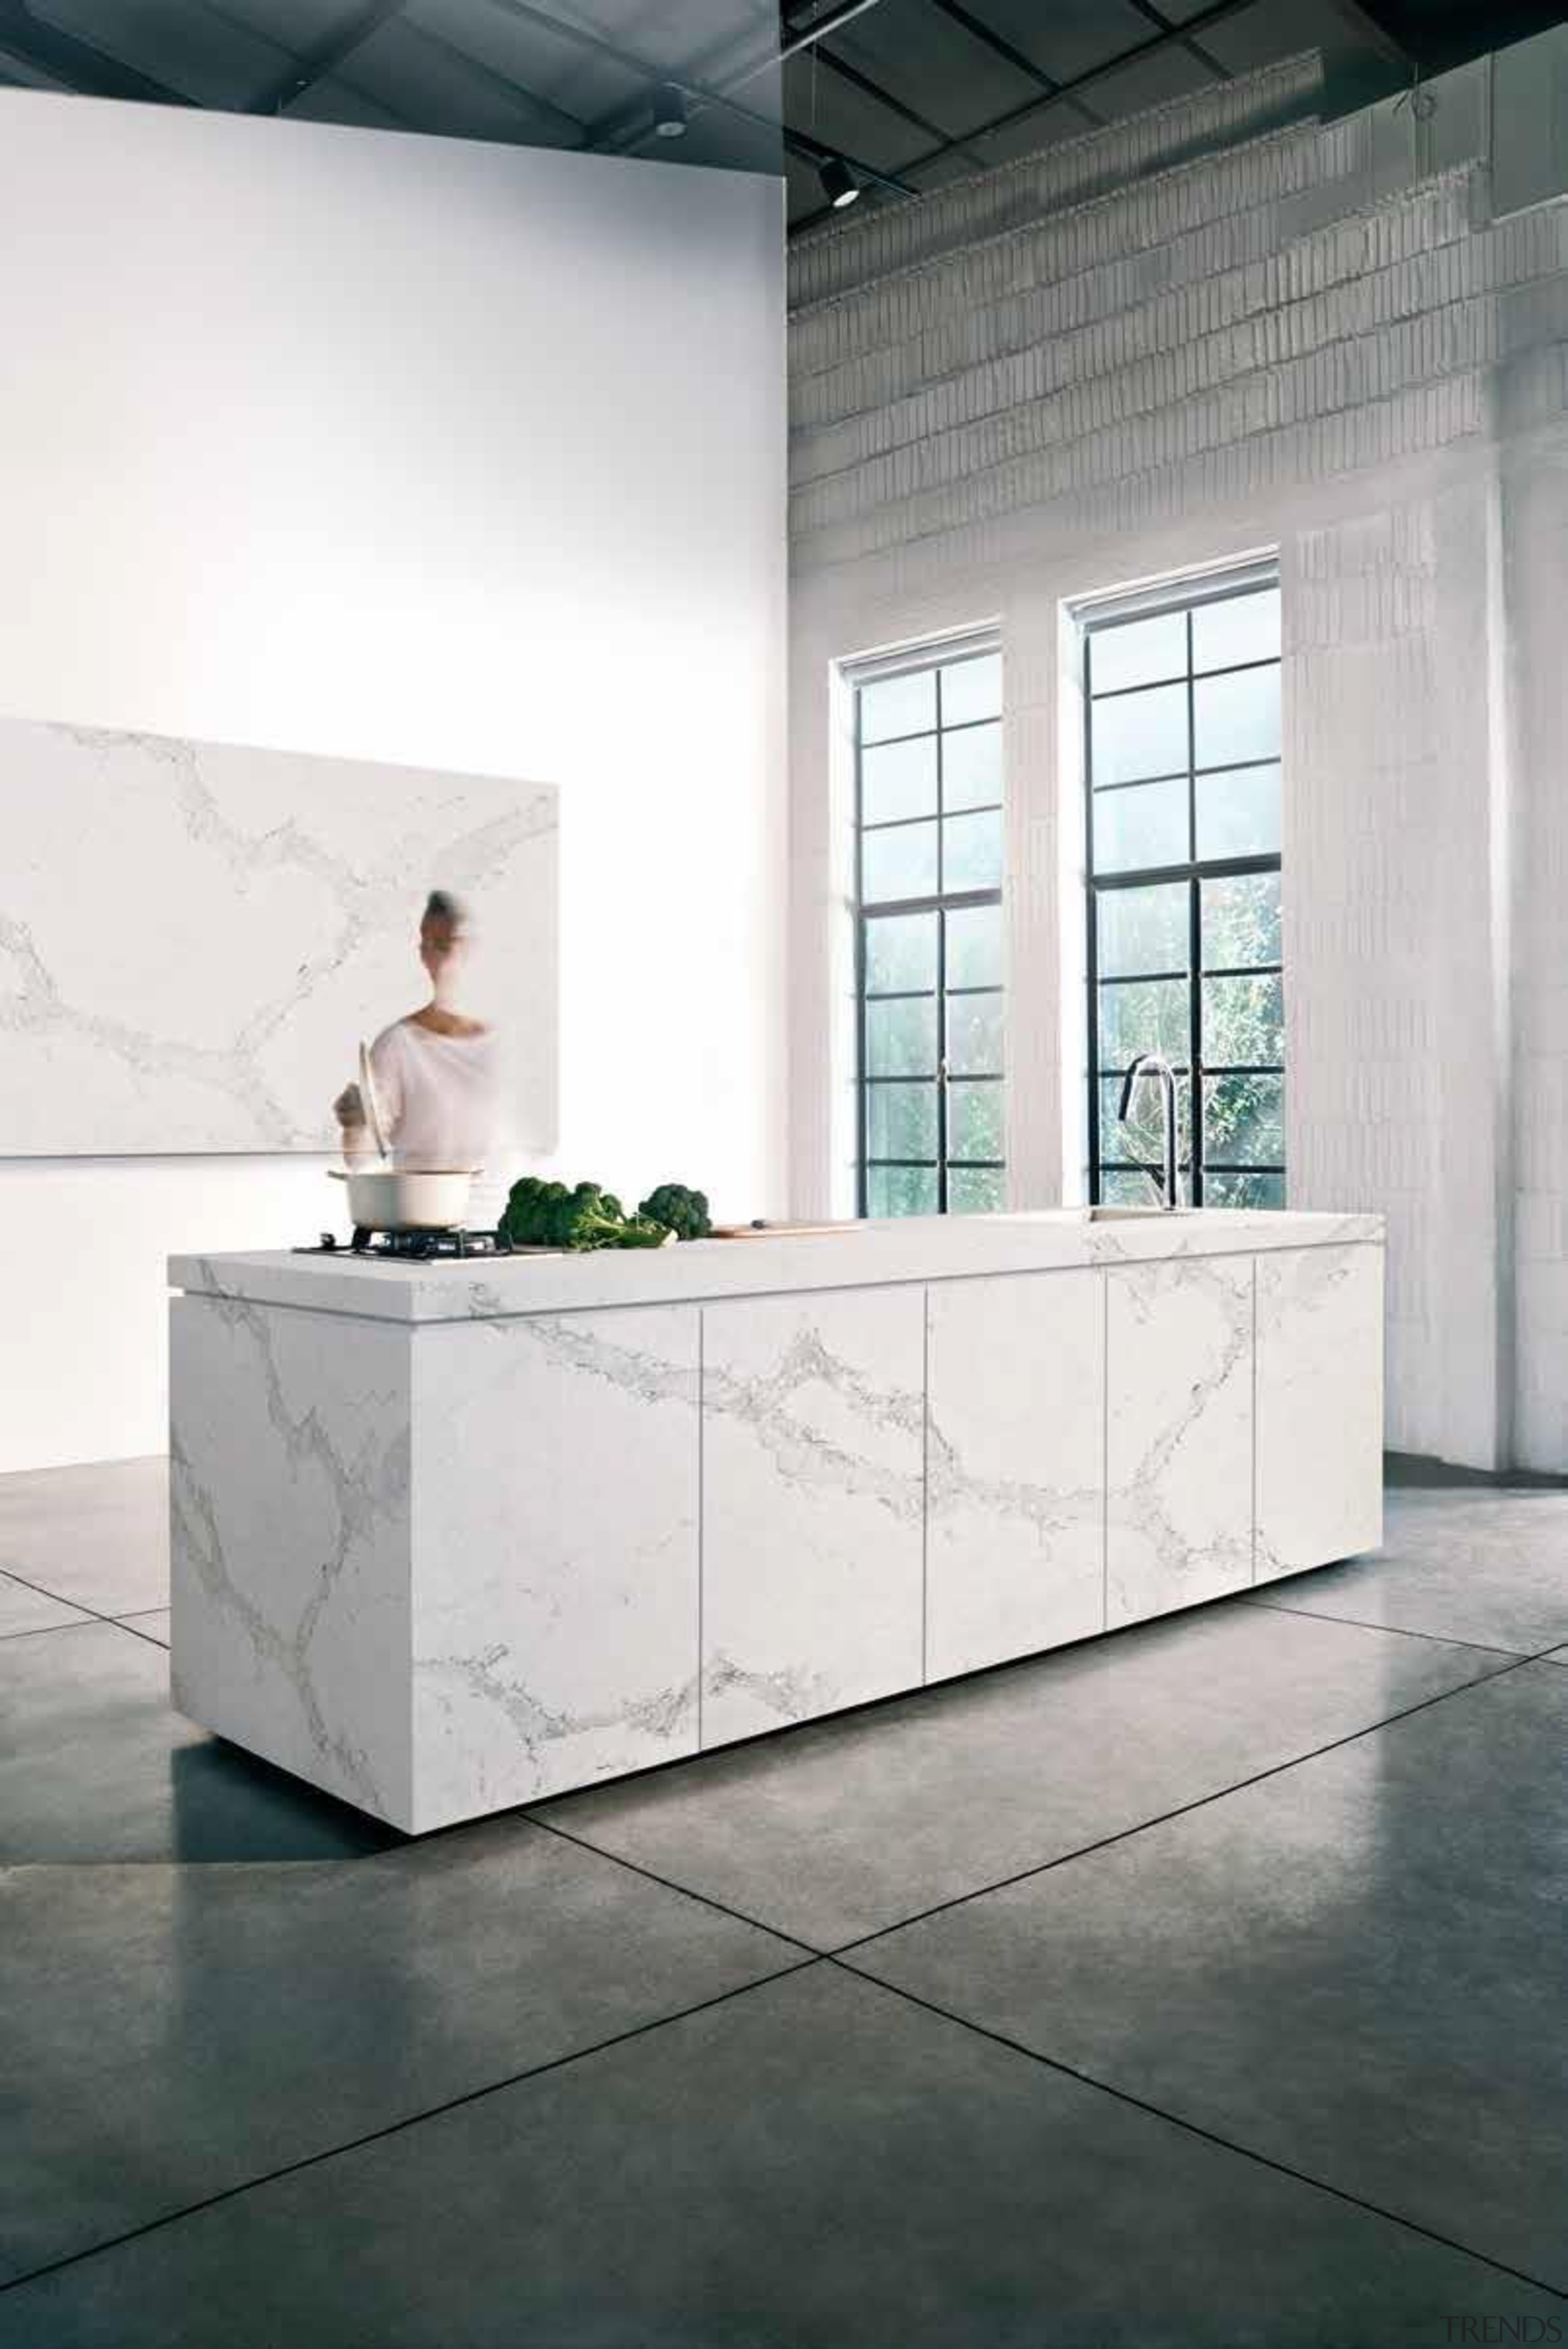 calacattaclassicfp11.jpg - calacattaclassicfp11.jpg - architecture | bathroom | architecture, bathroom, floor, flooring, furniture, interior design, product design, table, white, gray